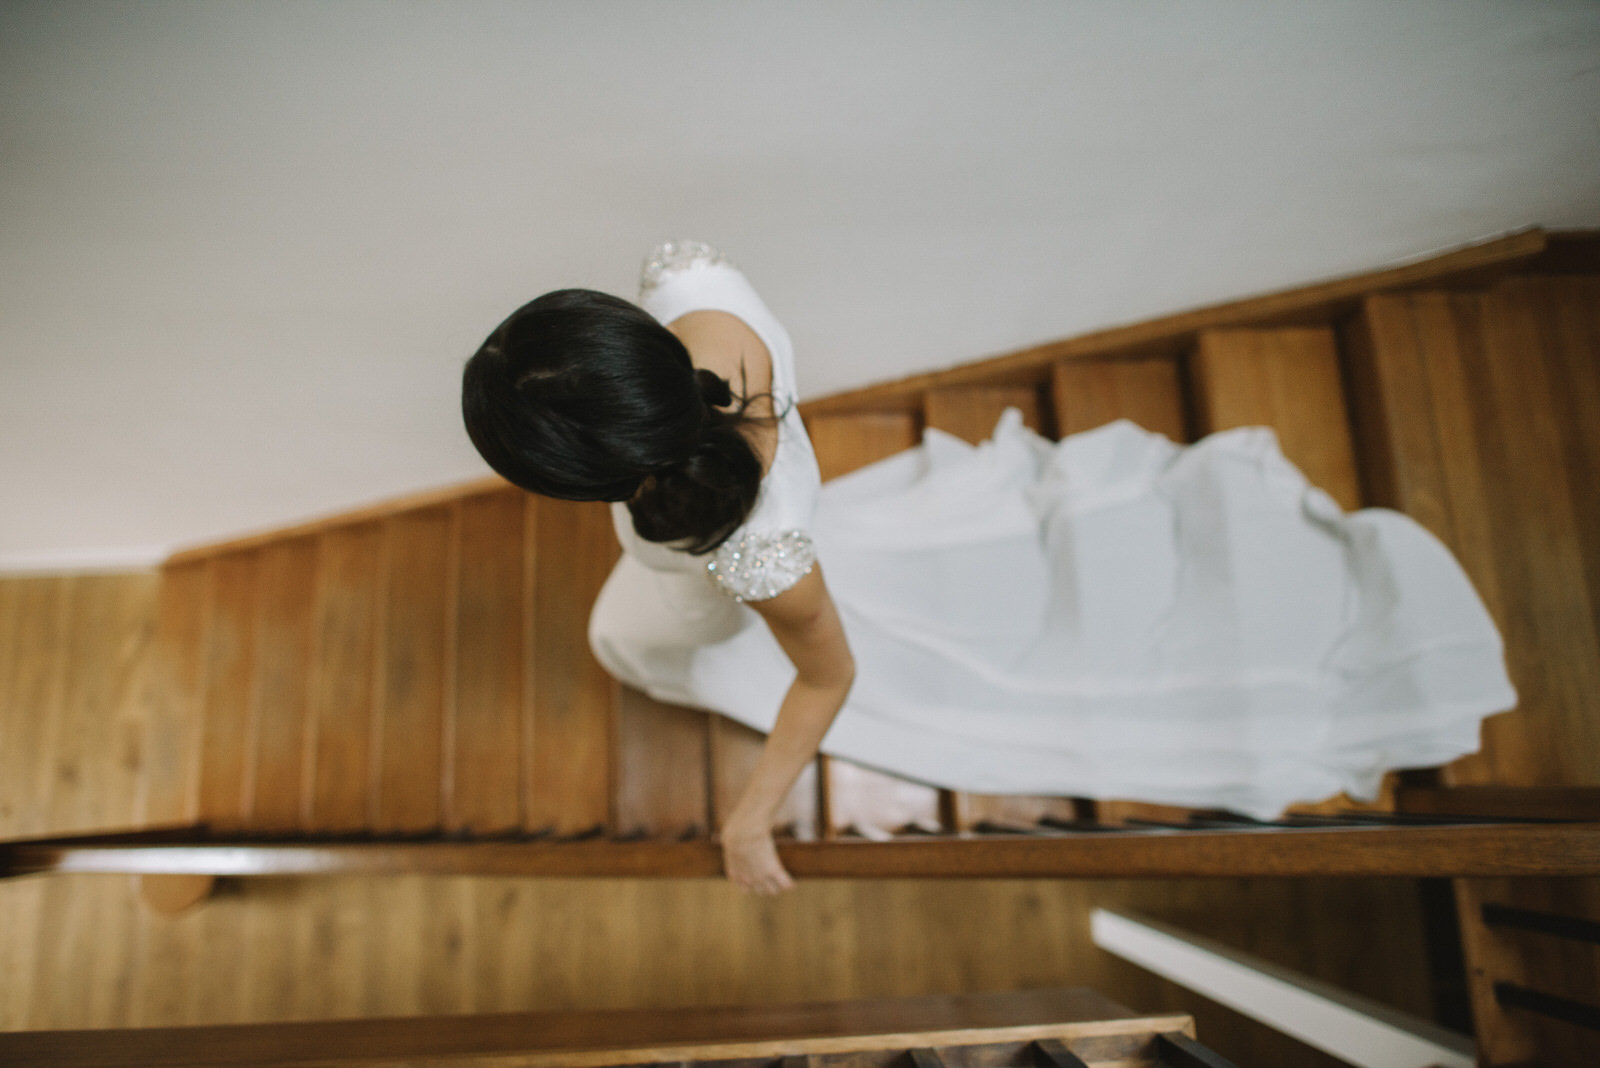 022-GUARDSWELL-FARM-WEDDING-ALTERNATIVE-SCOTTISH-WEDDING-PHOTOGRAPHER-SCOTTISH-WEDDING-DESTINATION-WEDDING-PHOTOGRAPHER.JPG